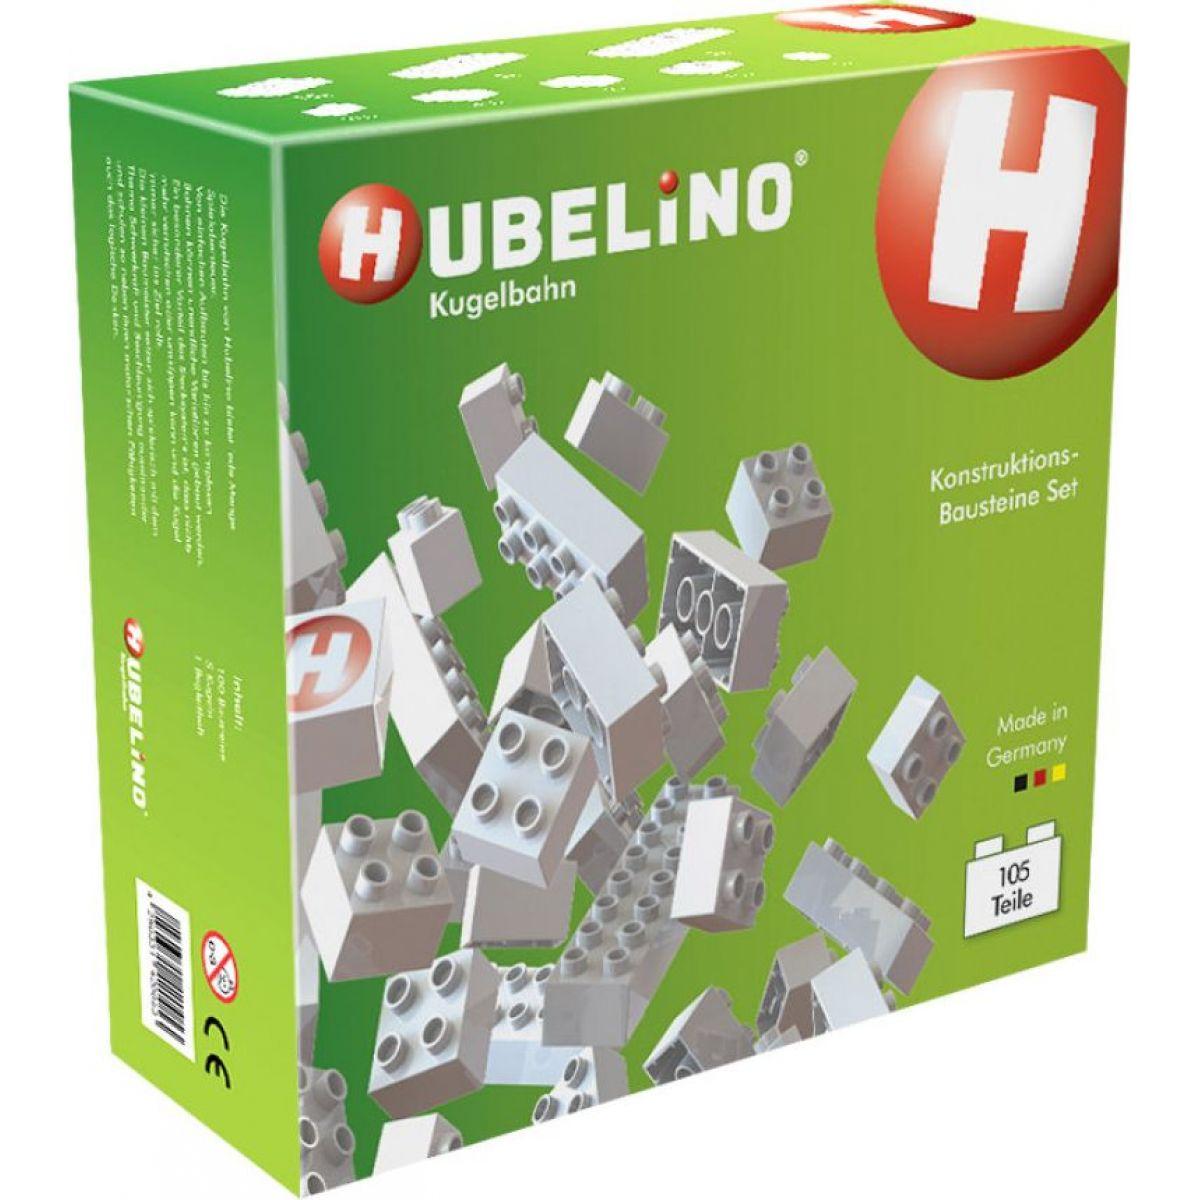 Hubelino stavebný set 105 dielikov